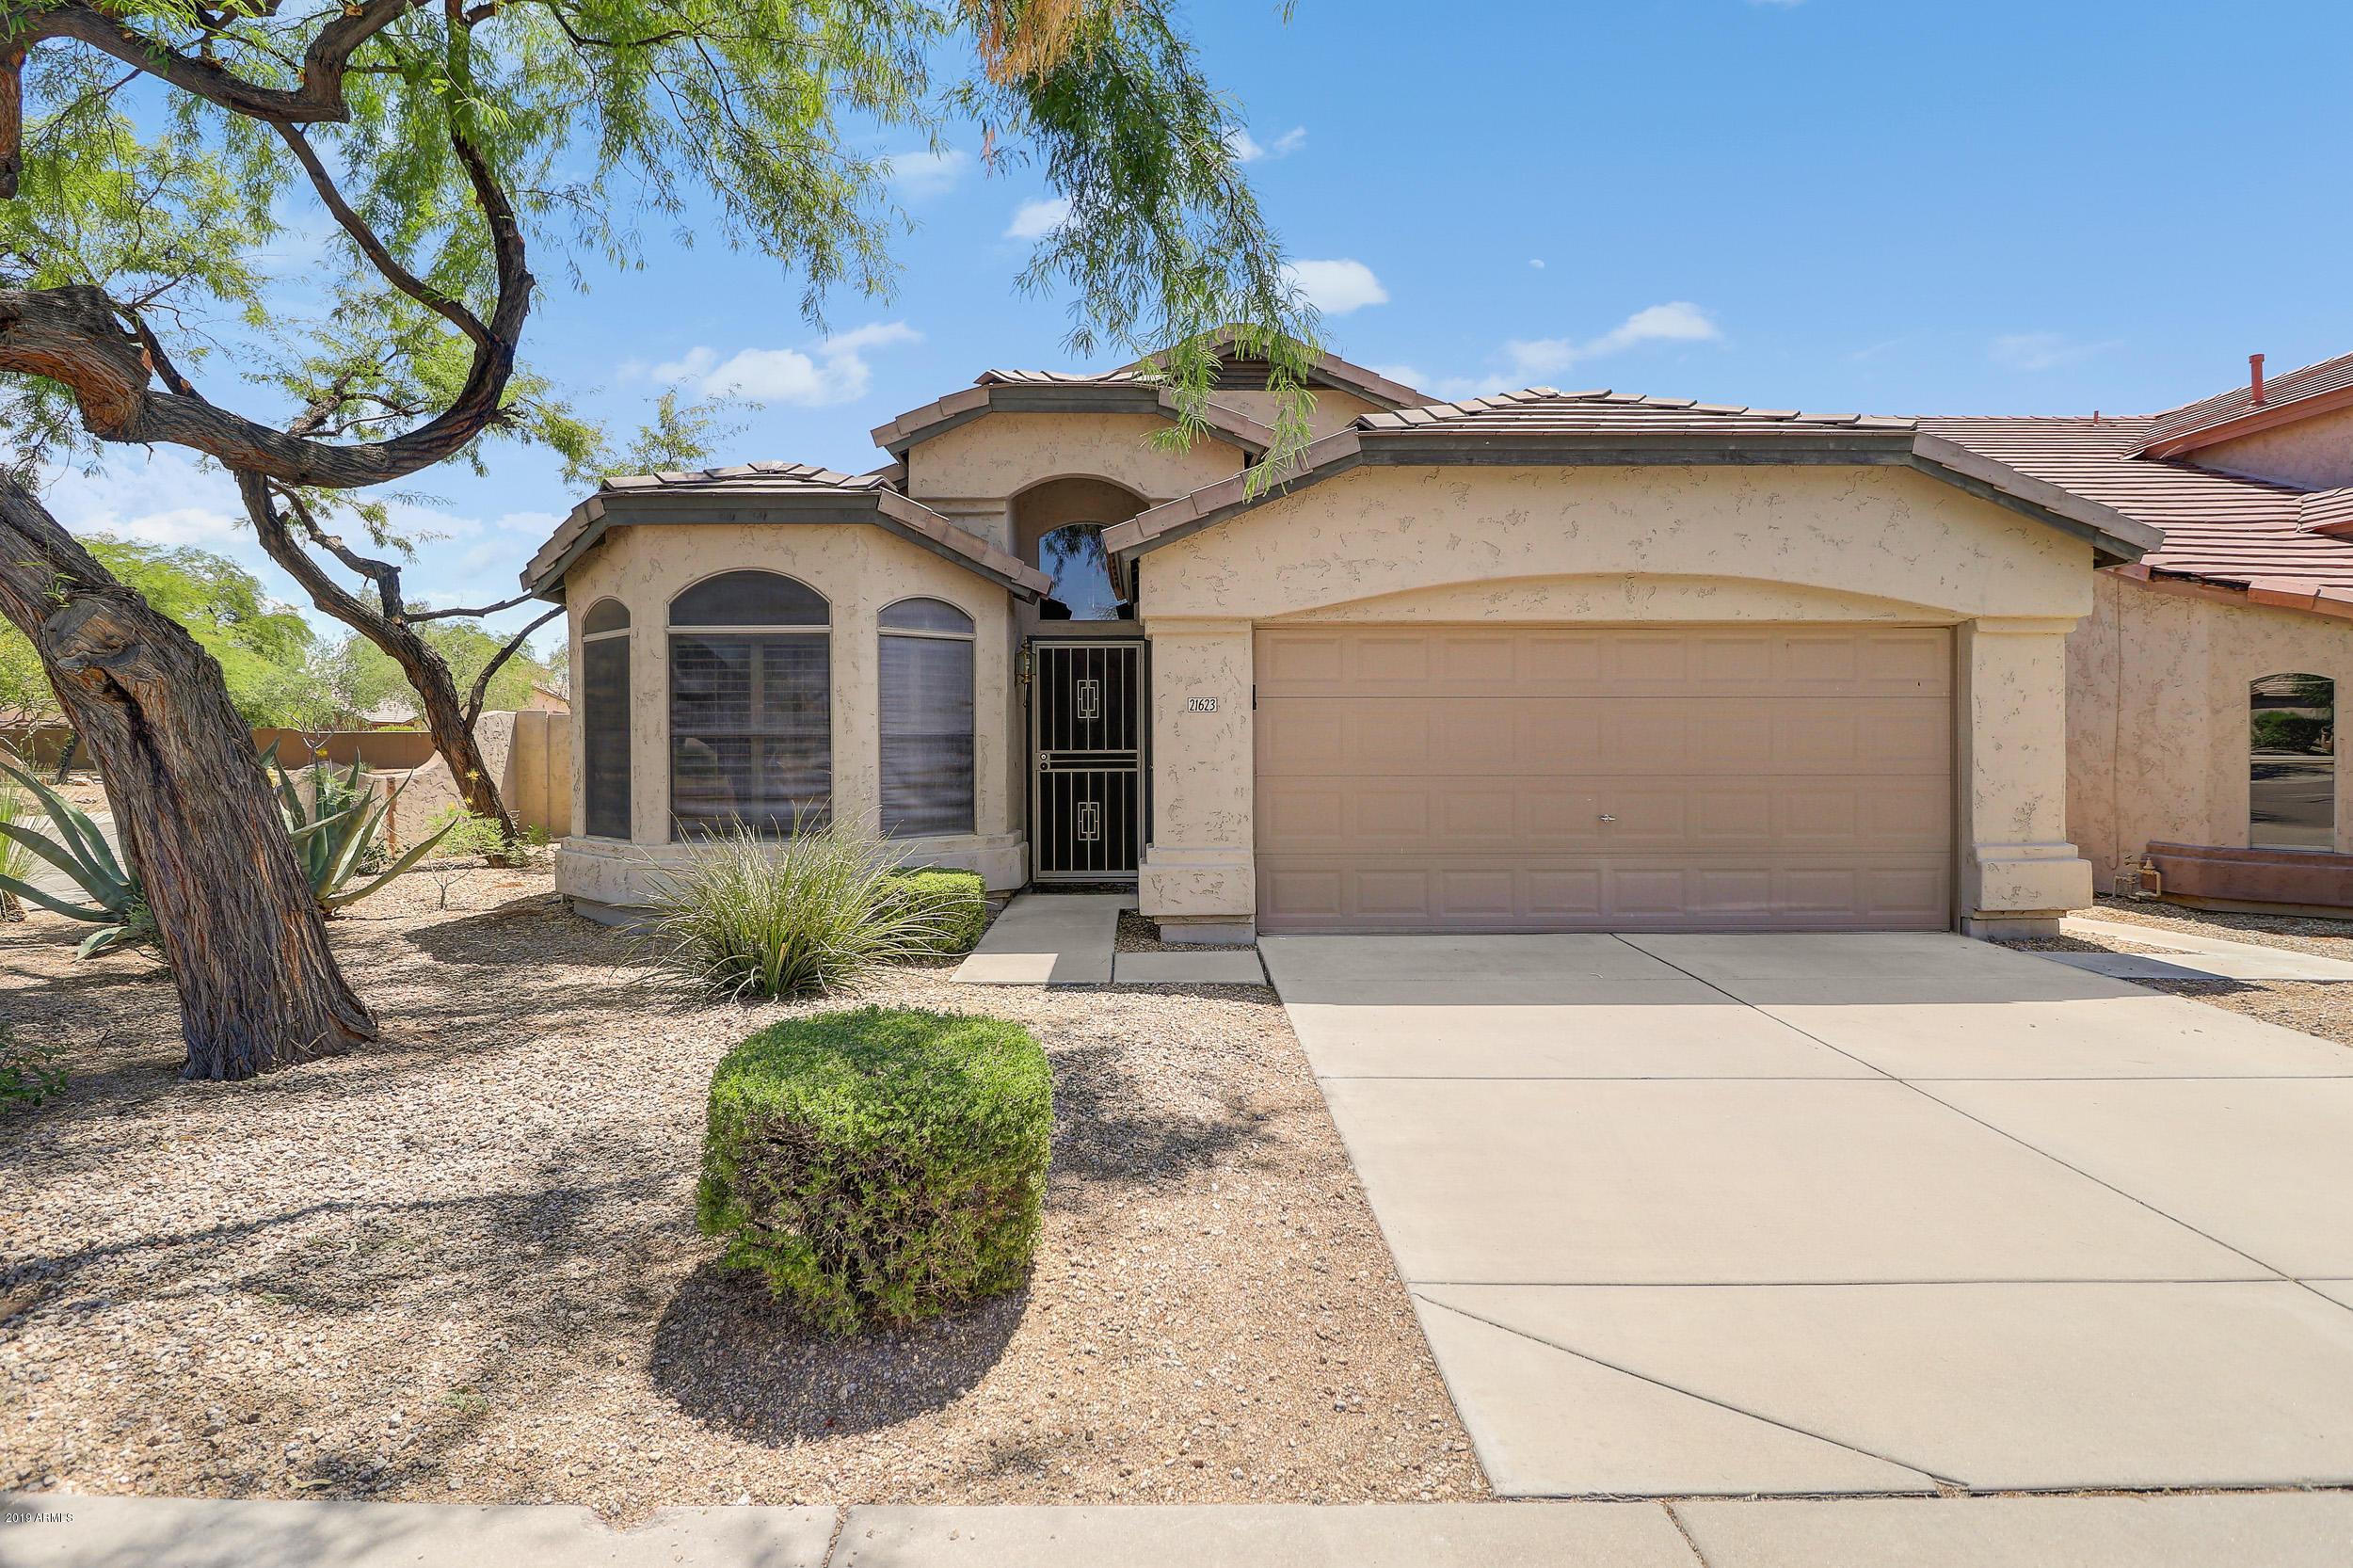 21623 N 43RD Place, Desert Ridge in Maricopa County, AZ 85050 Home for Sale